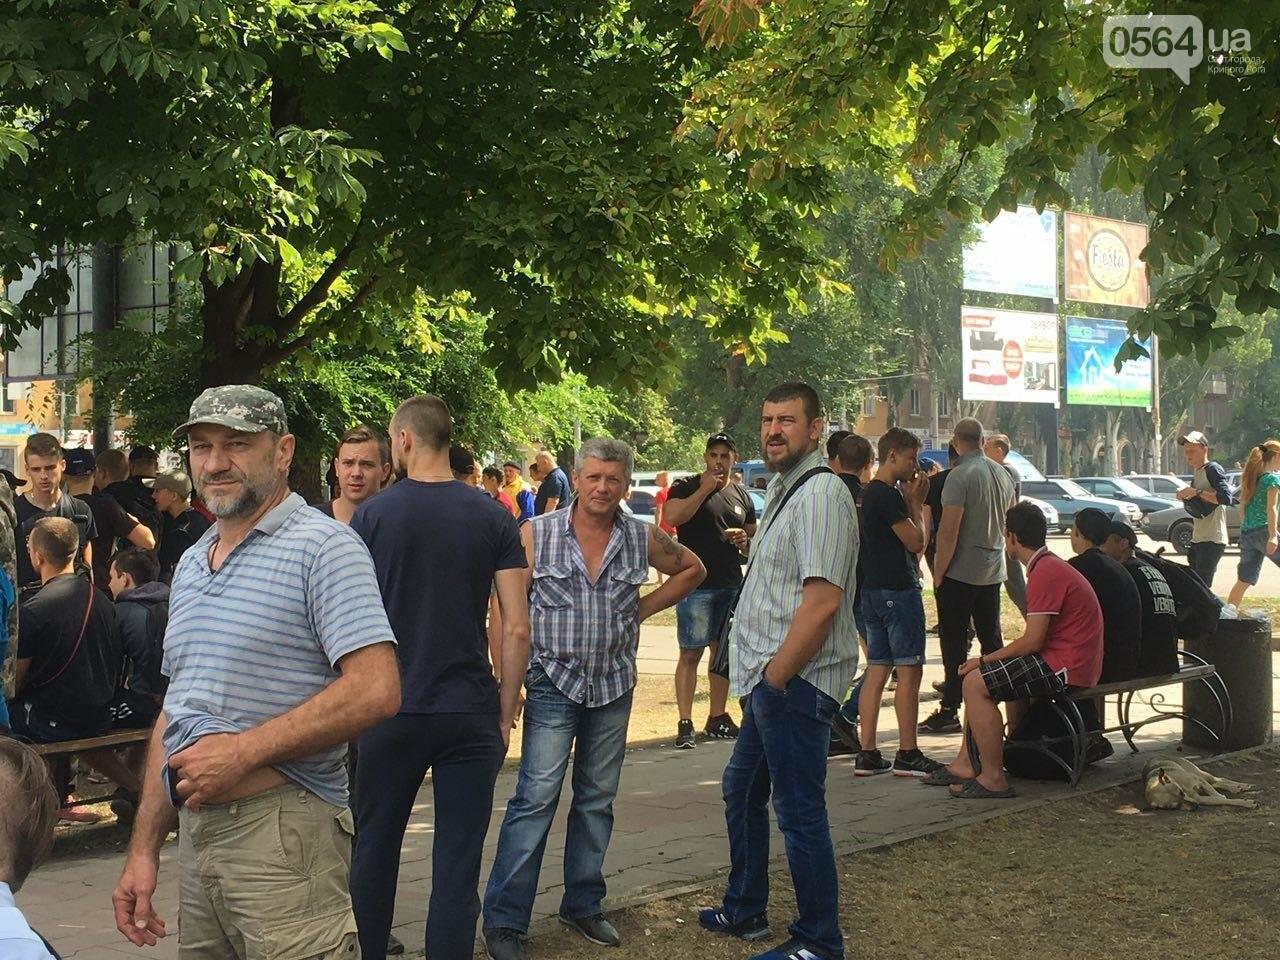 Трубят рога: В Кривом Роге собрались противники ЛГБТ-движения, - ФОТО, ВИДЕО, фото-10